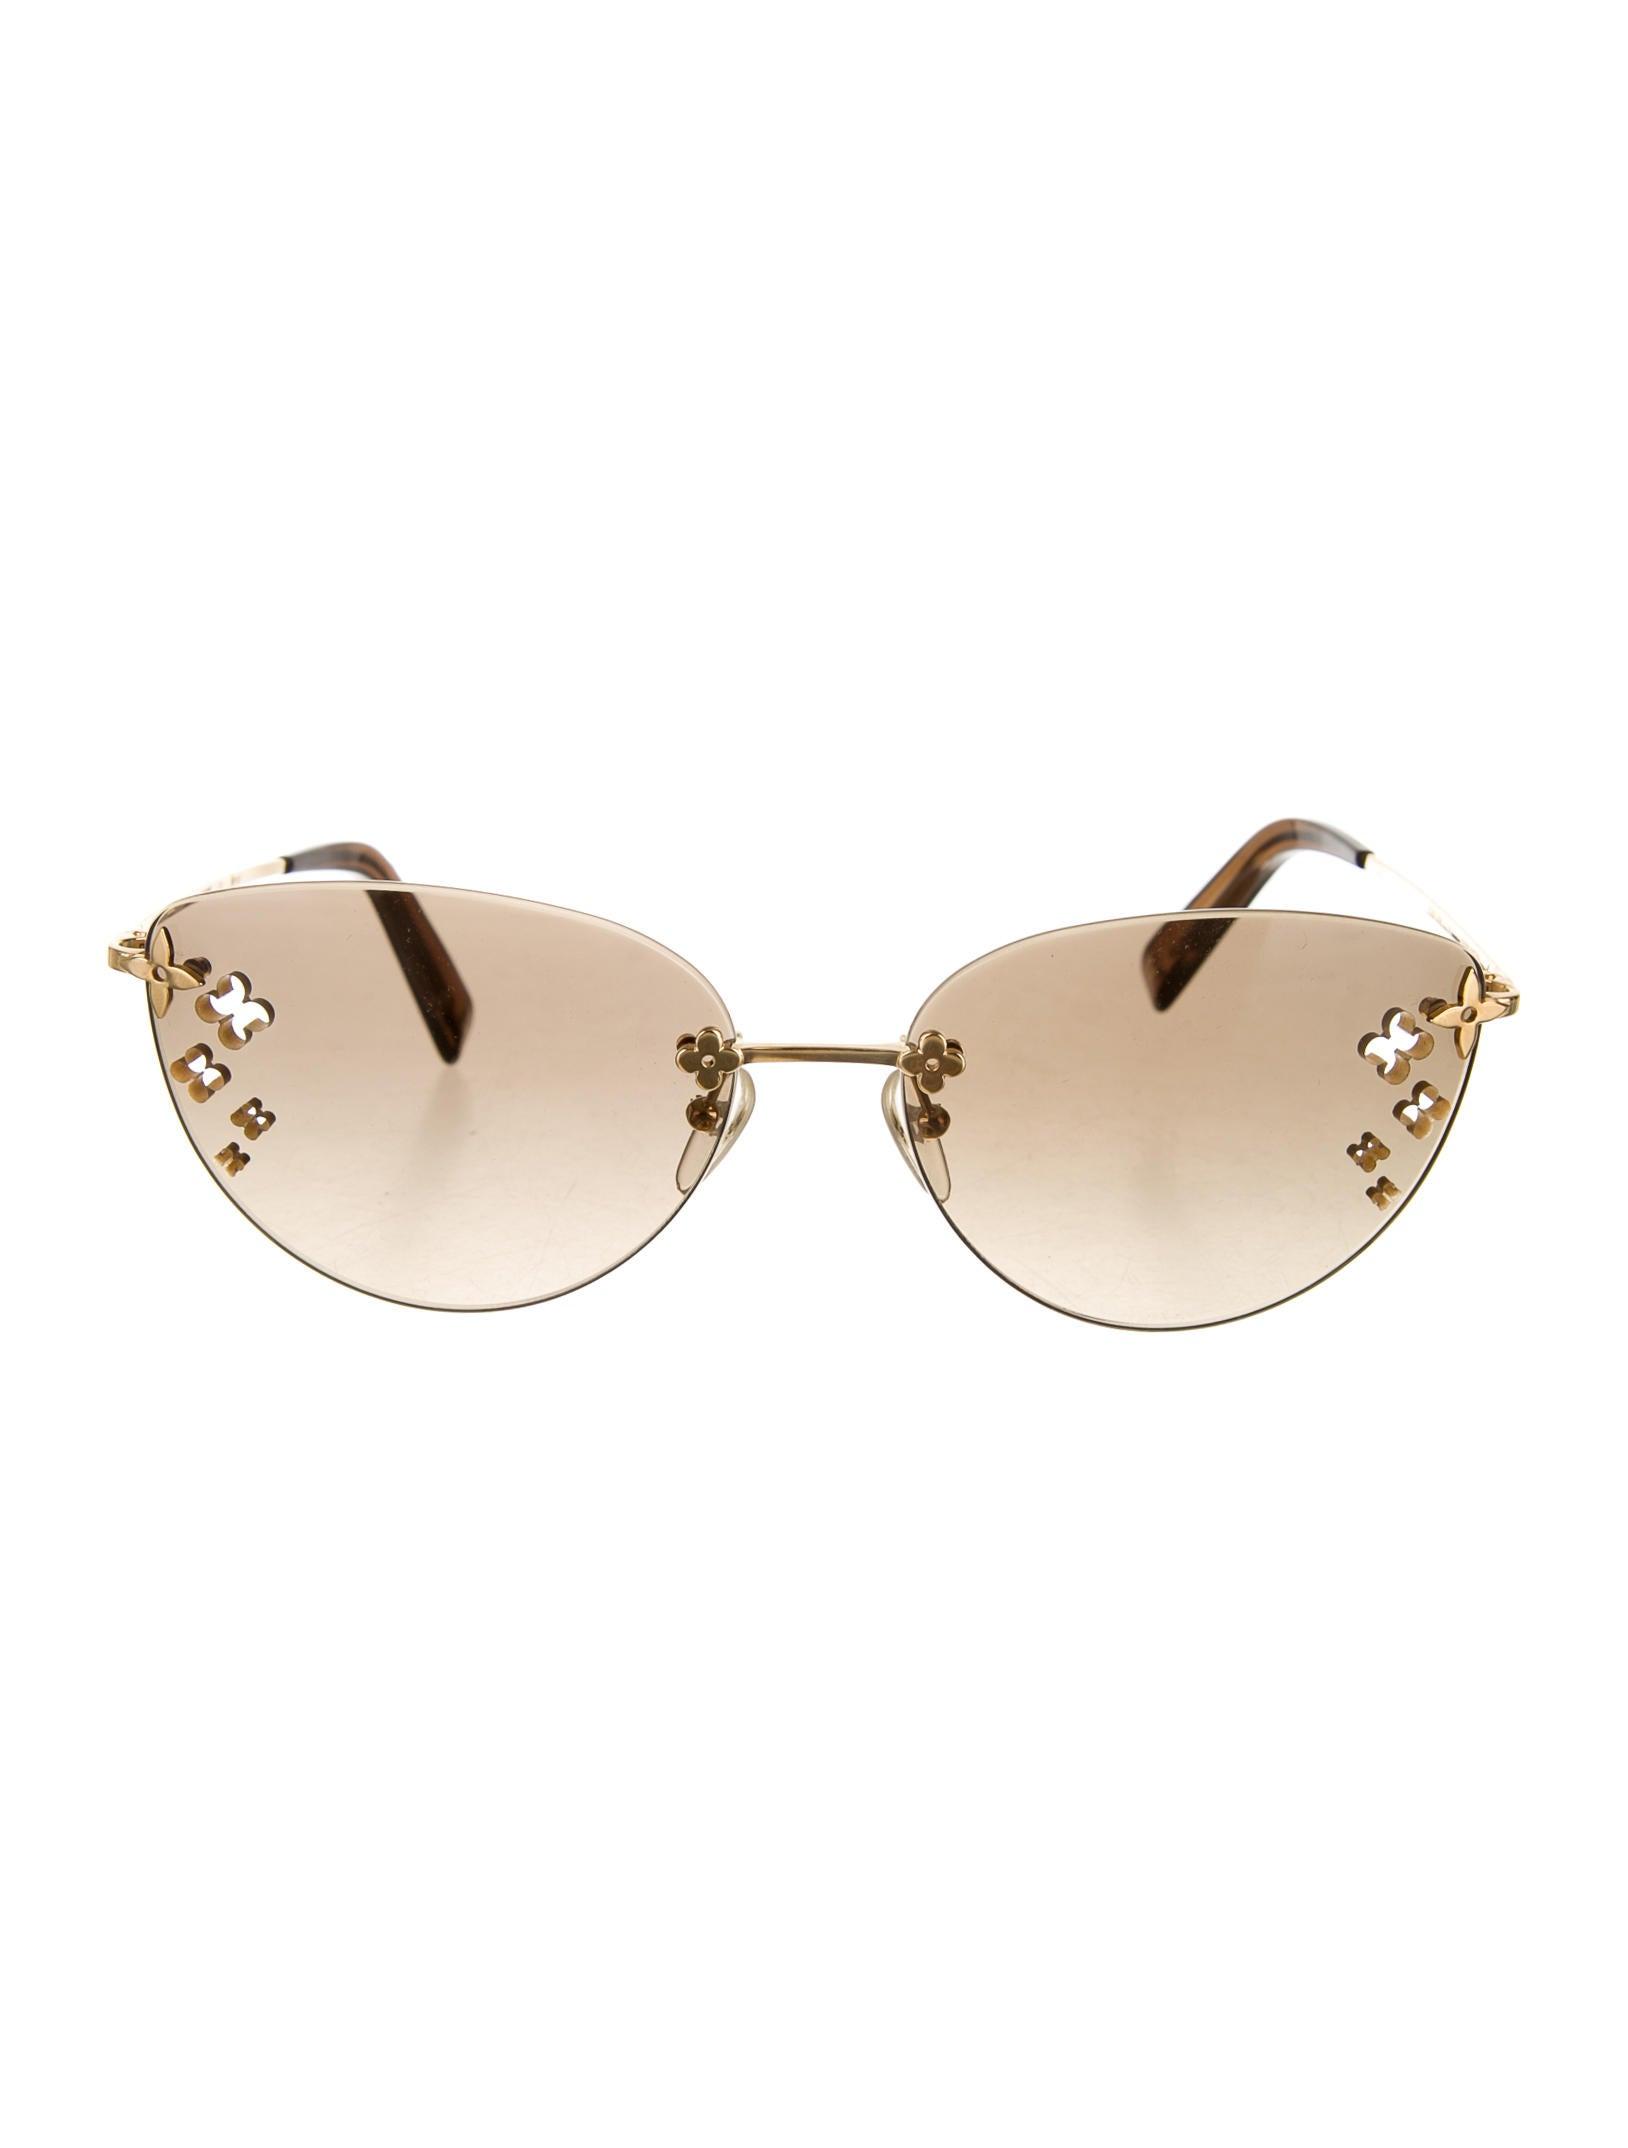 0afb7121a8 Louis Vuitton Desmayo Cat-Eye Sunglasses - Accessories - LOU37638 ...